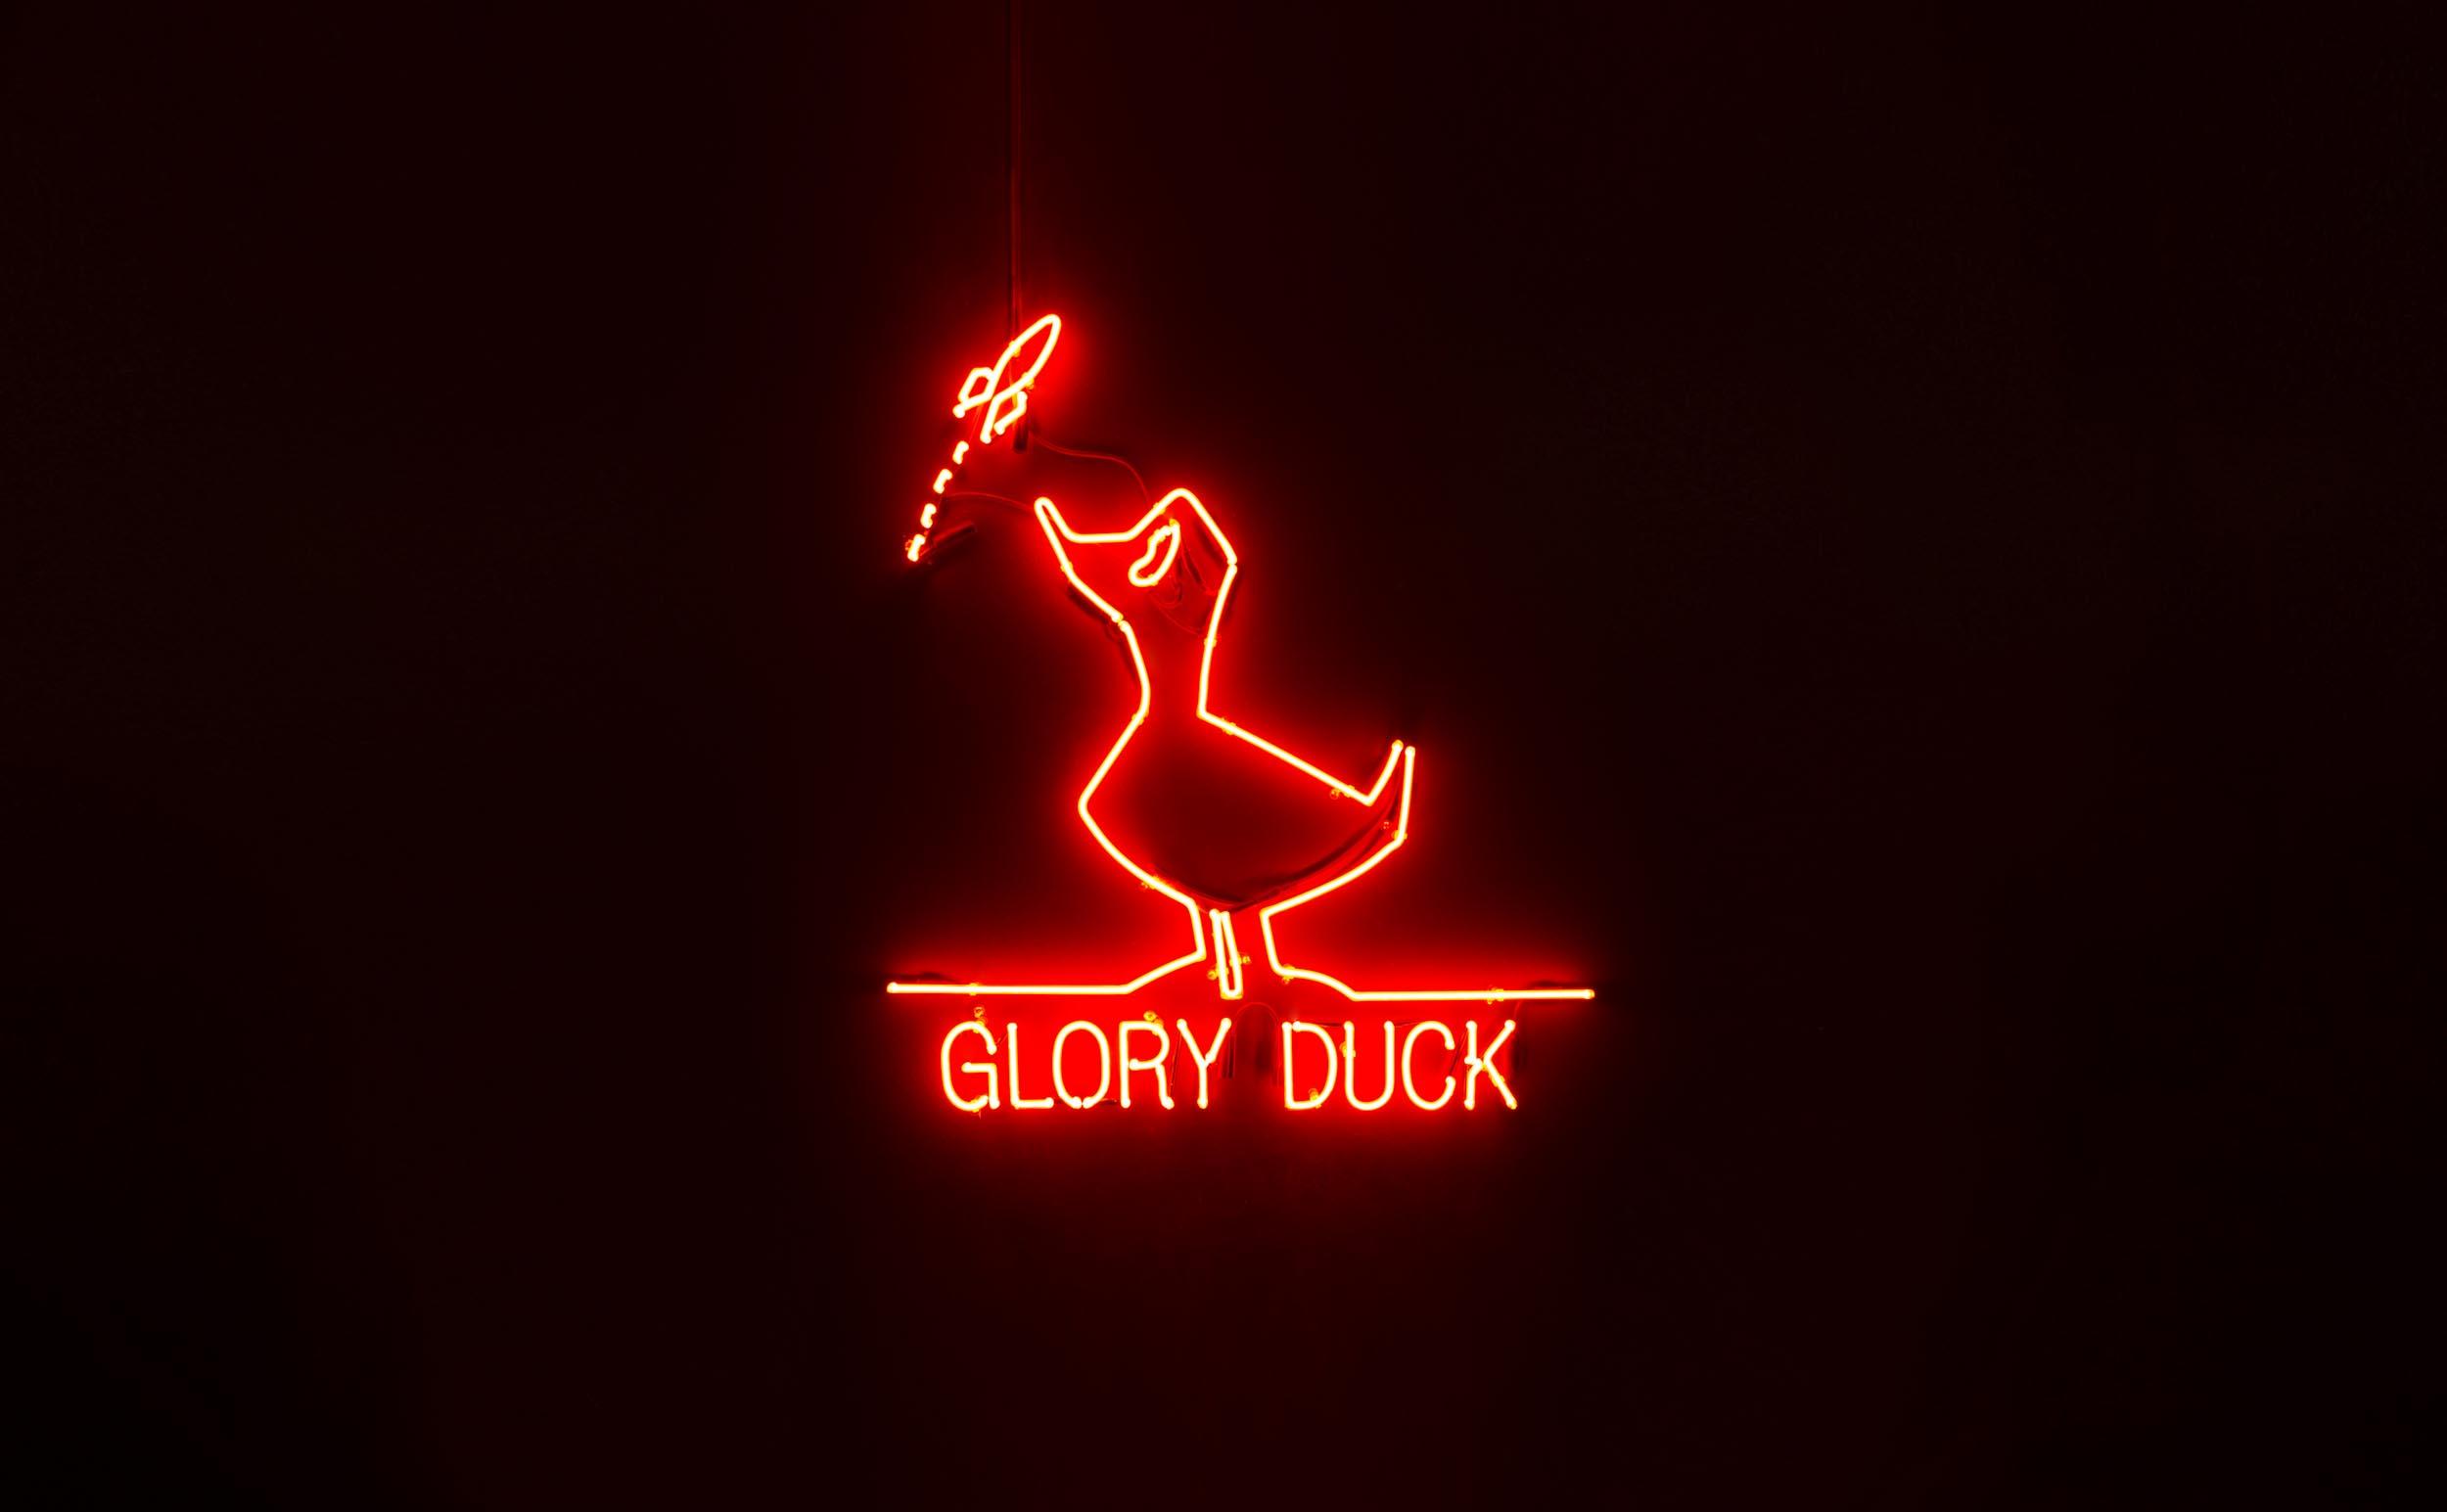 glory-duck-wp-09